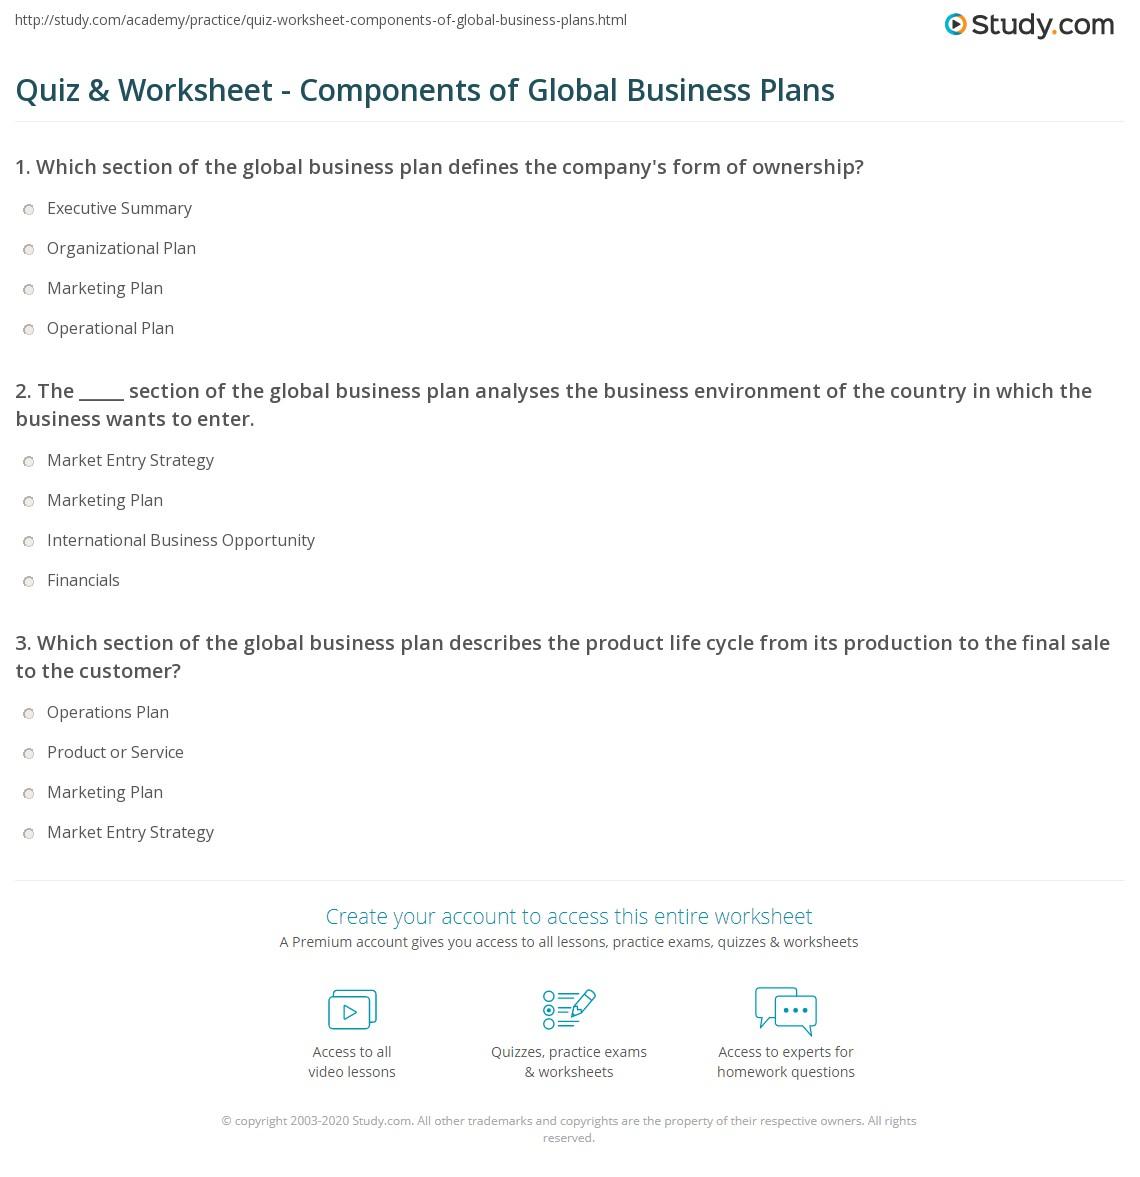 quiz worksheet components of global business plans study com